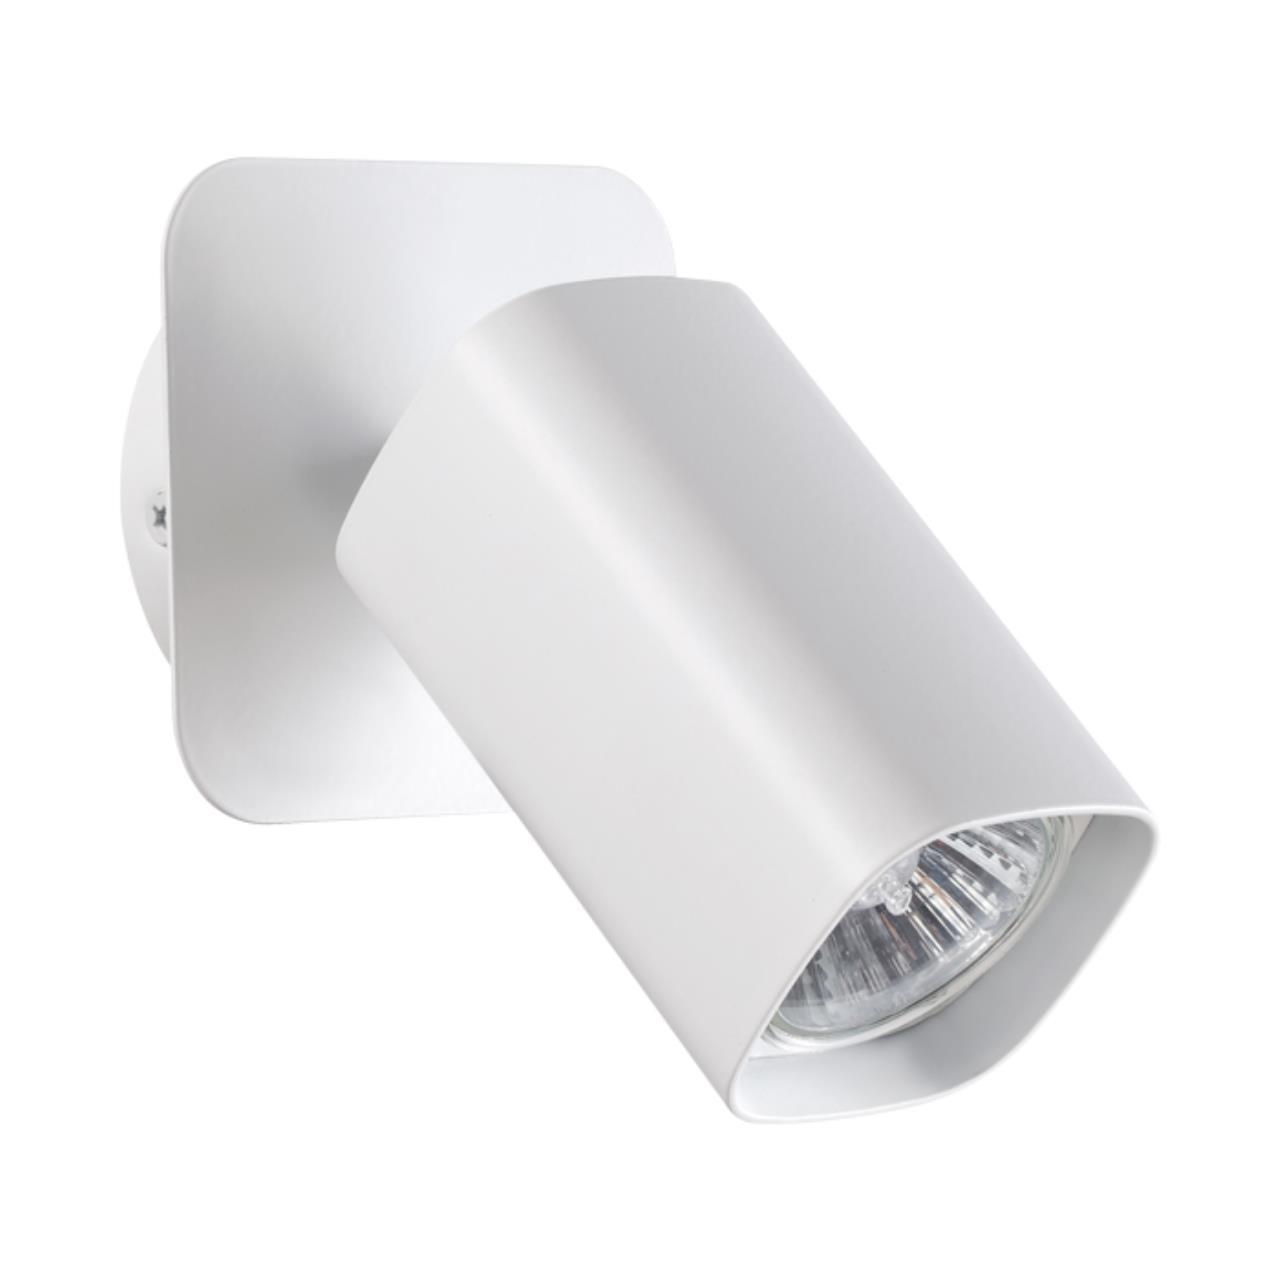 370553 OVER NT19 103 белый Накладной светильник IP20 GU10 50W 230V GUSTO